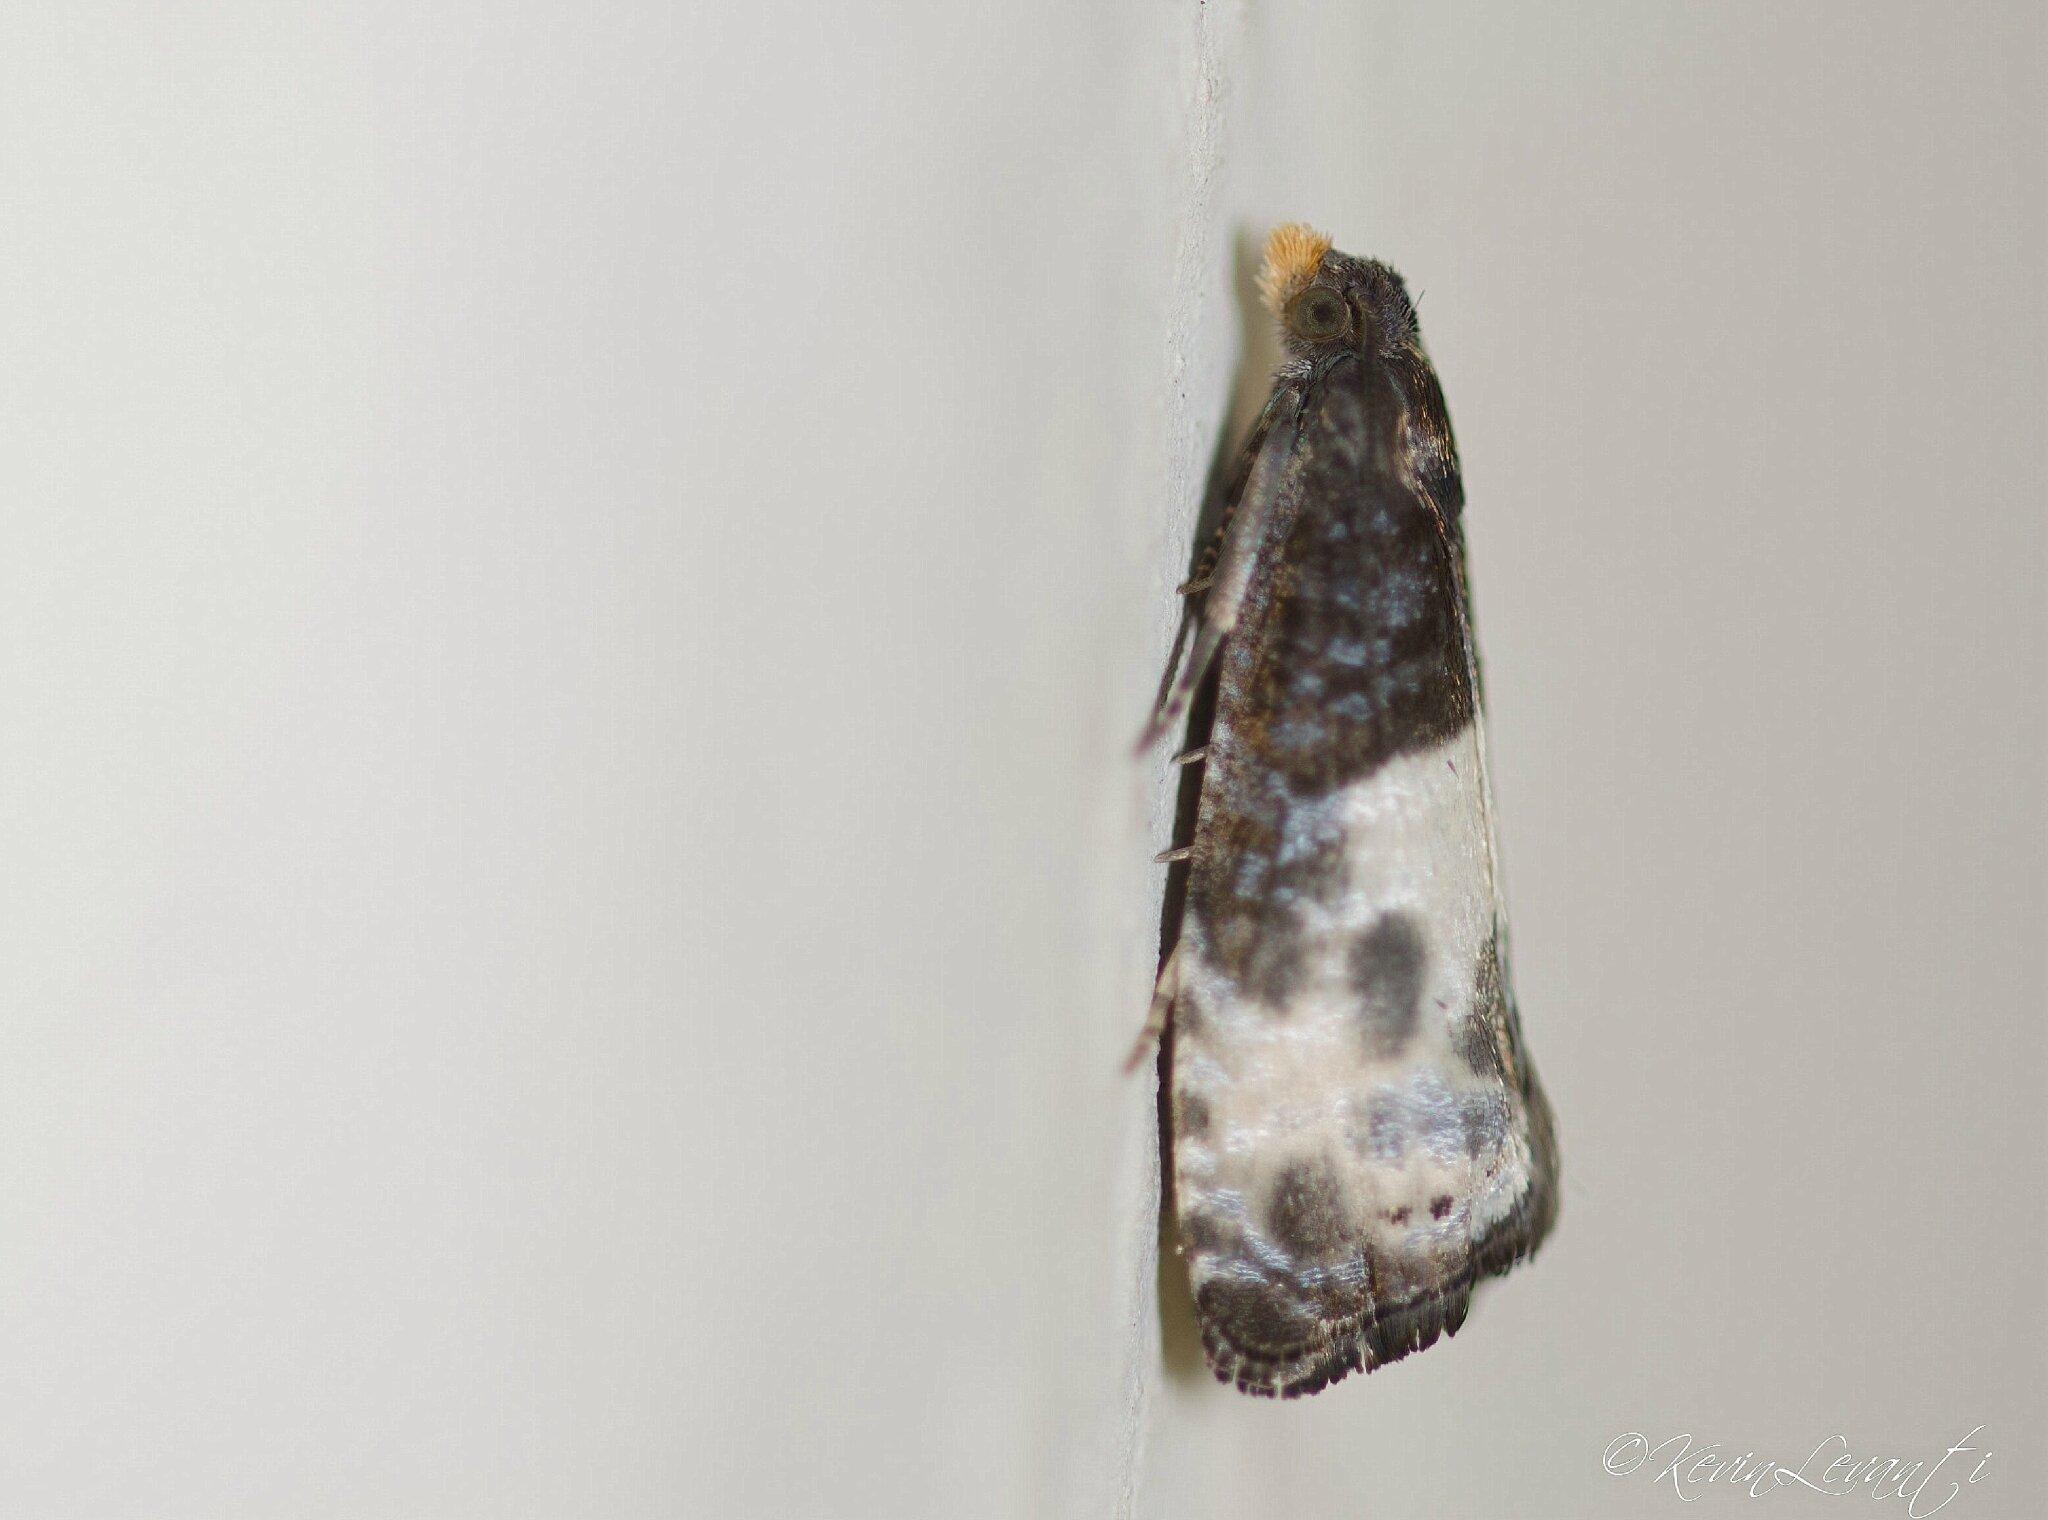 Notocelia cynosbatella